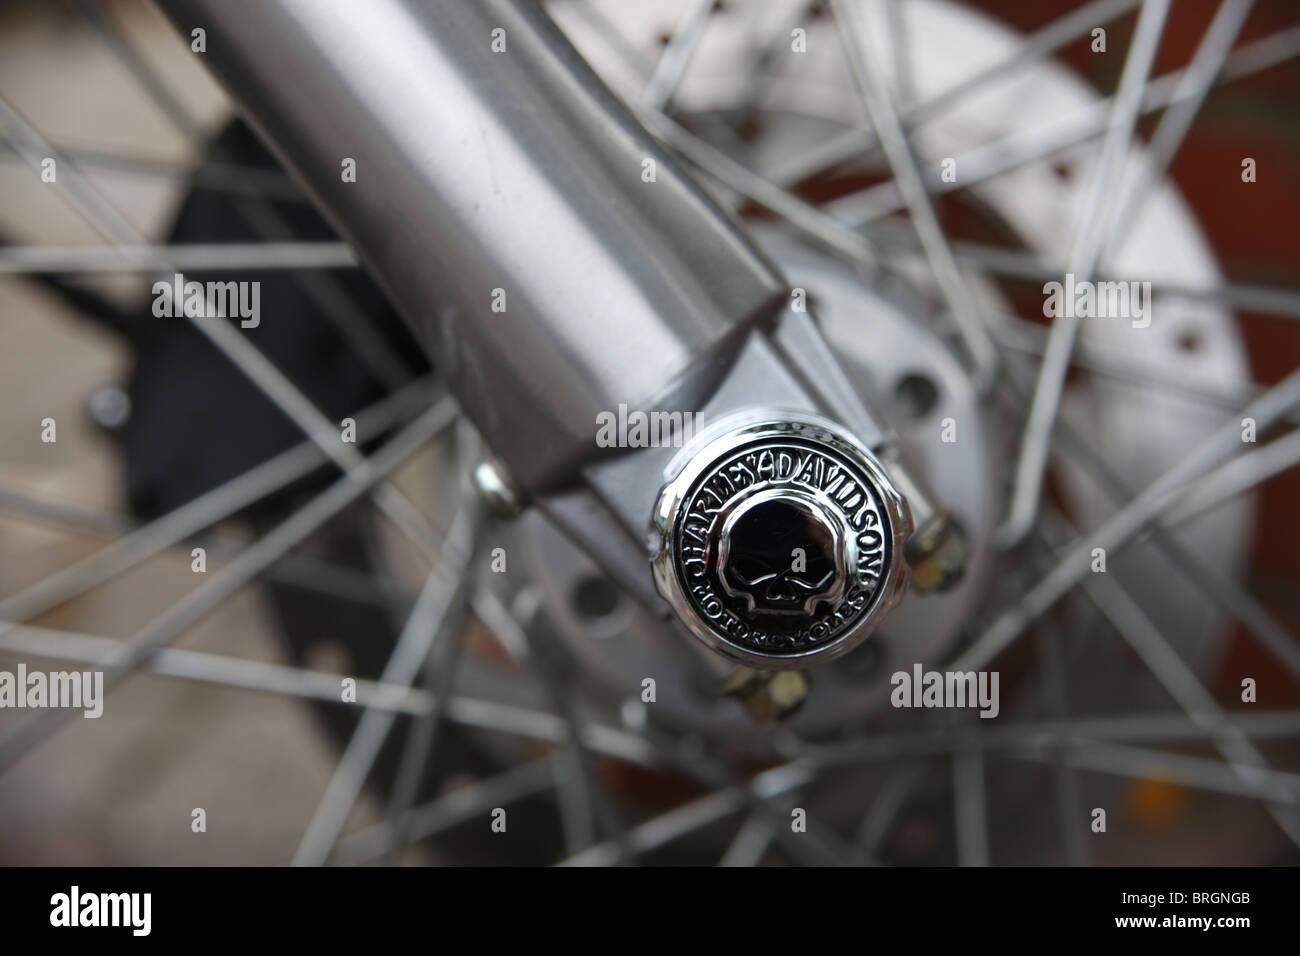 Harley Davidson fork detail featuring skull. - Stock Image